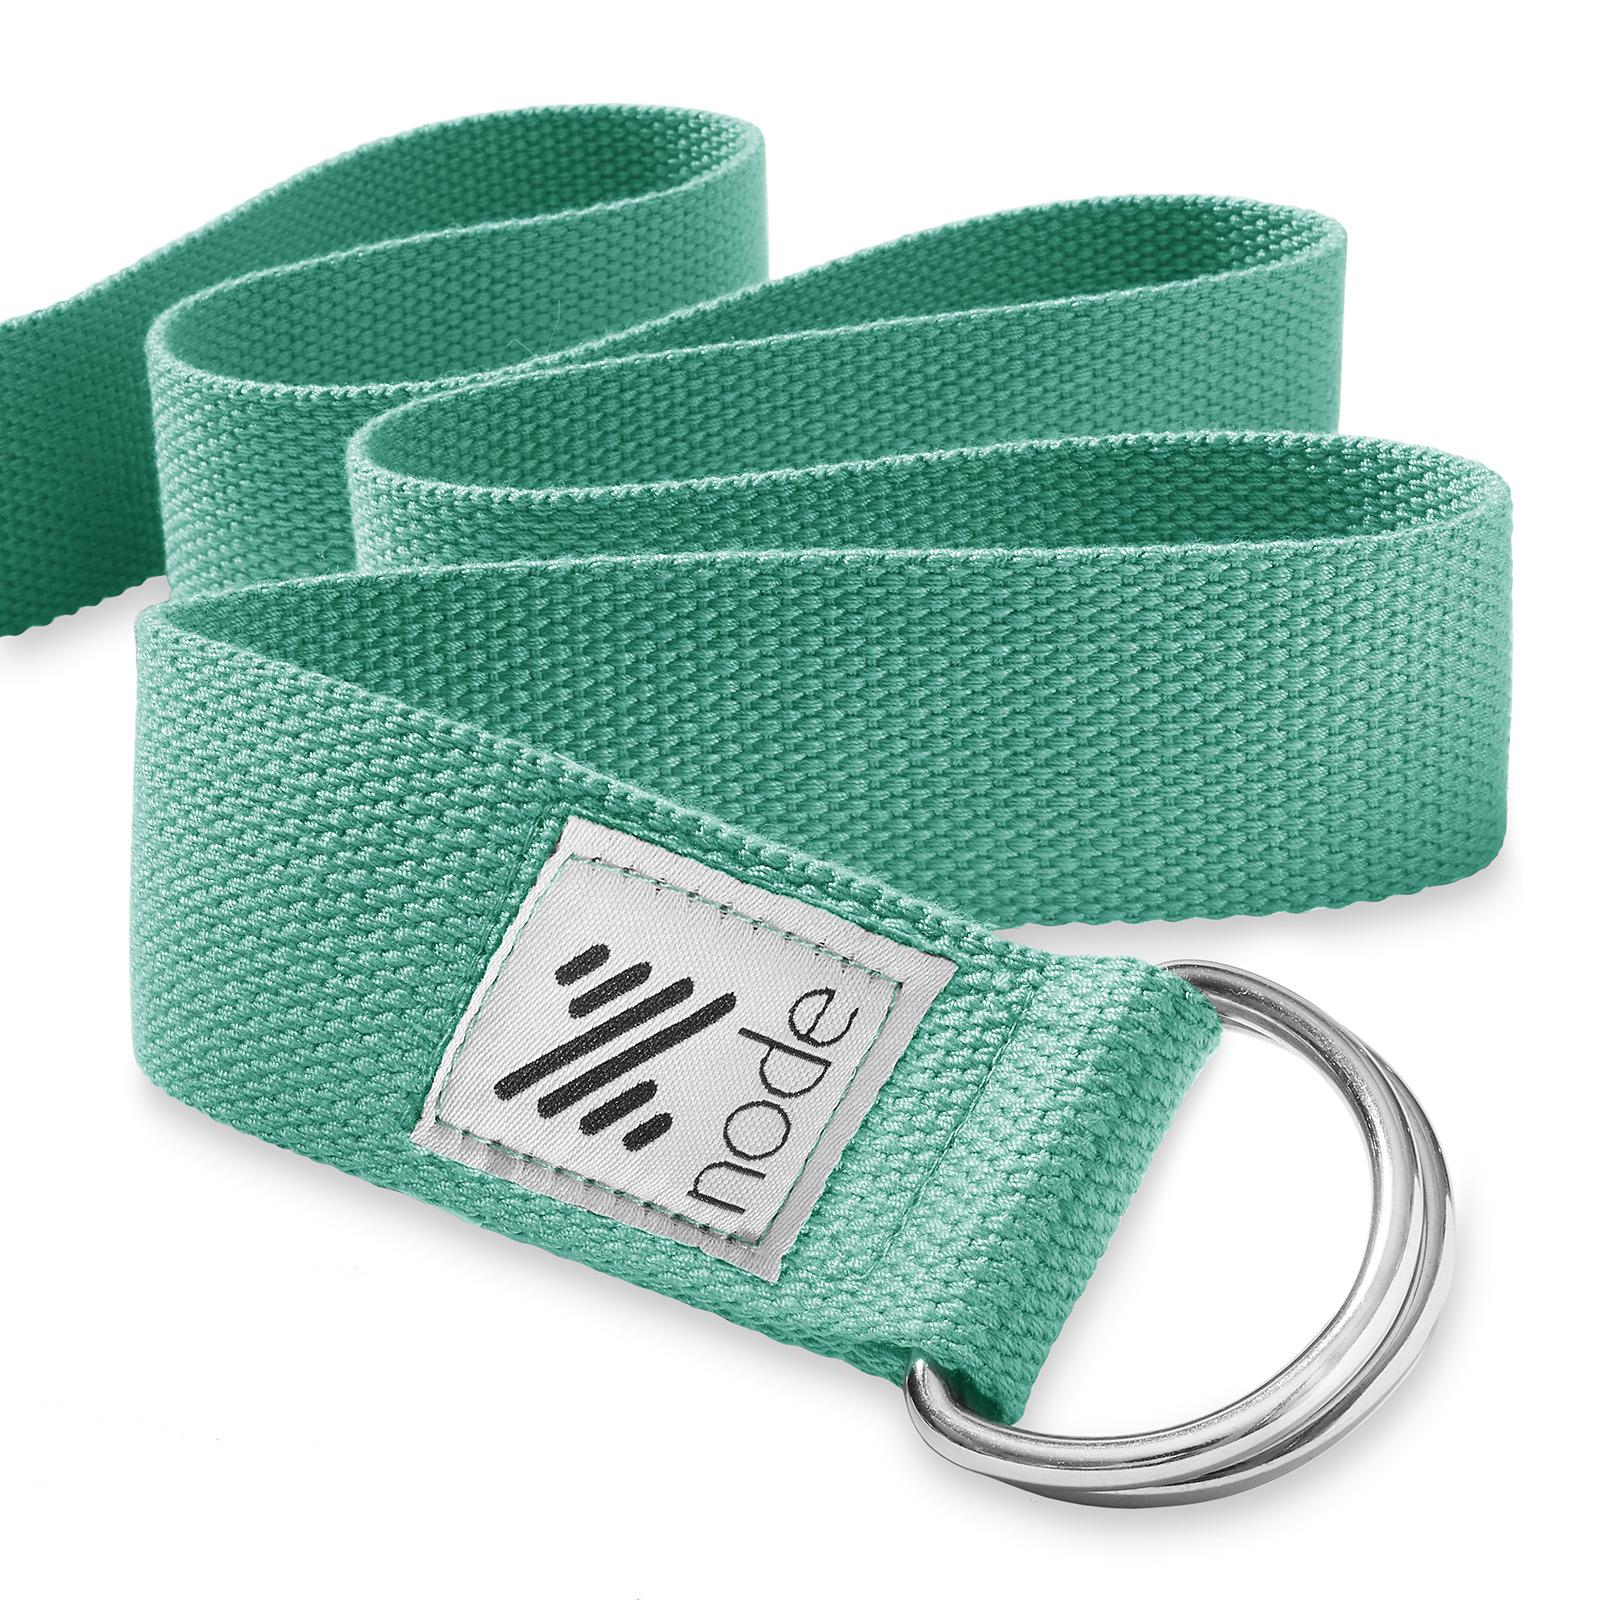 7-1-2-039-Woven-Cotton-Blend-Yoga-Strap-Stretching-Exercise-Prop-Belt thumbnail 34